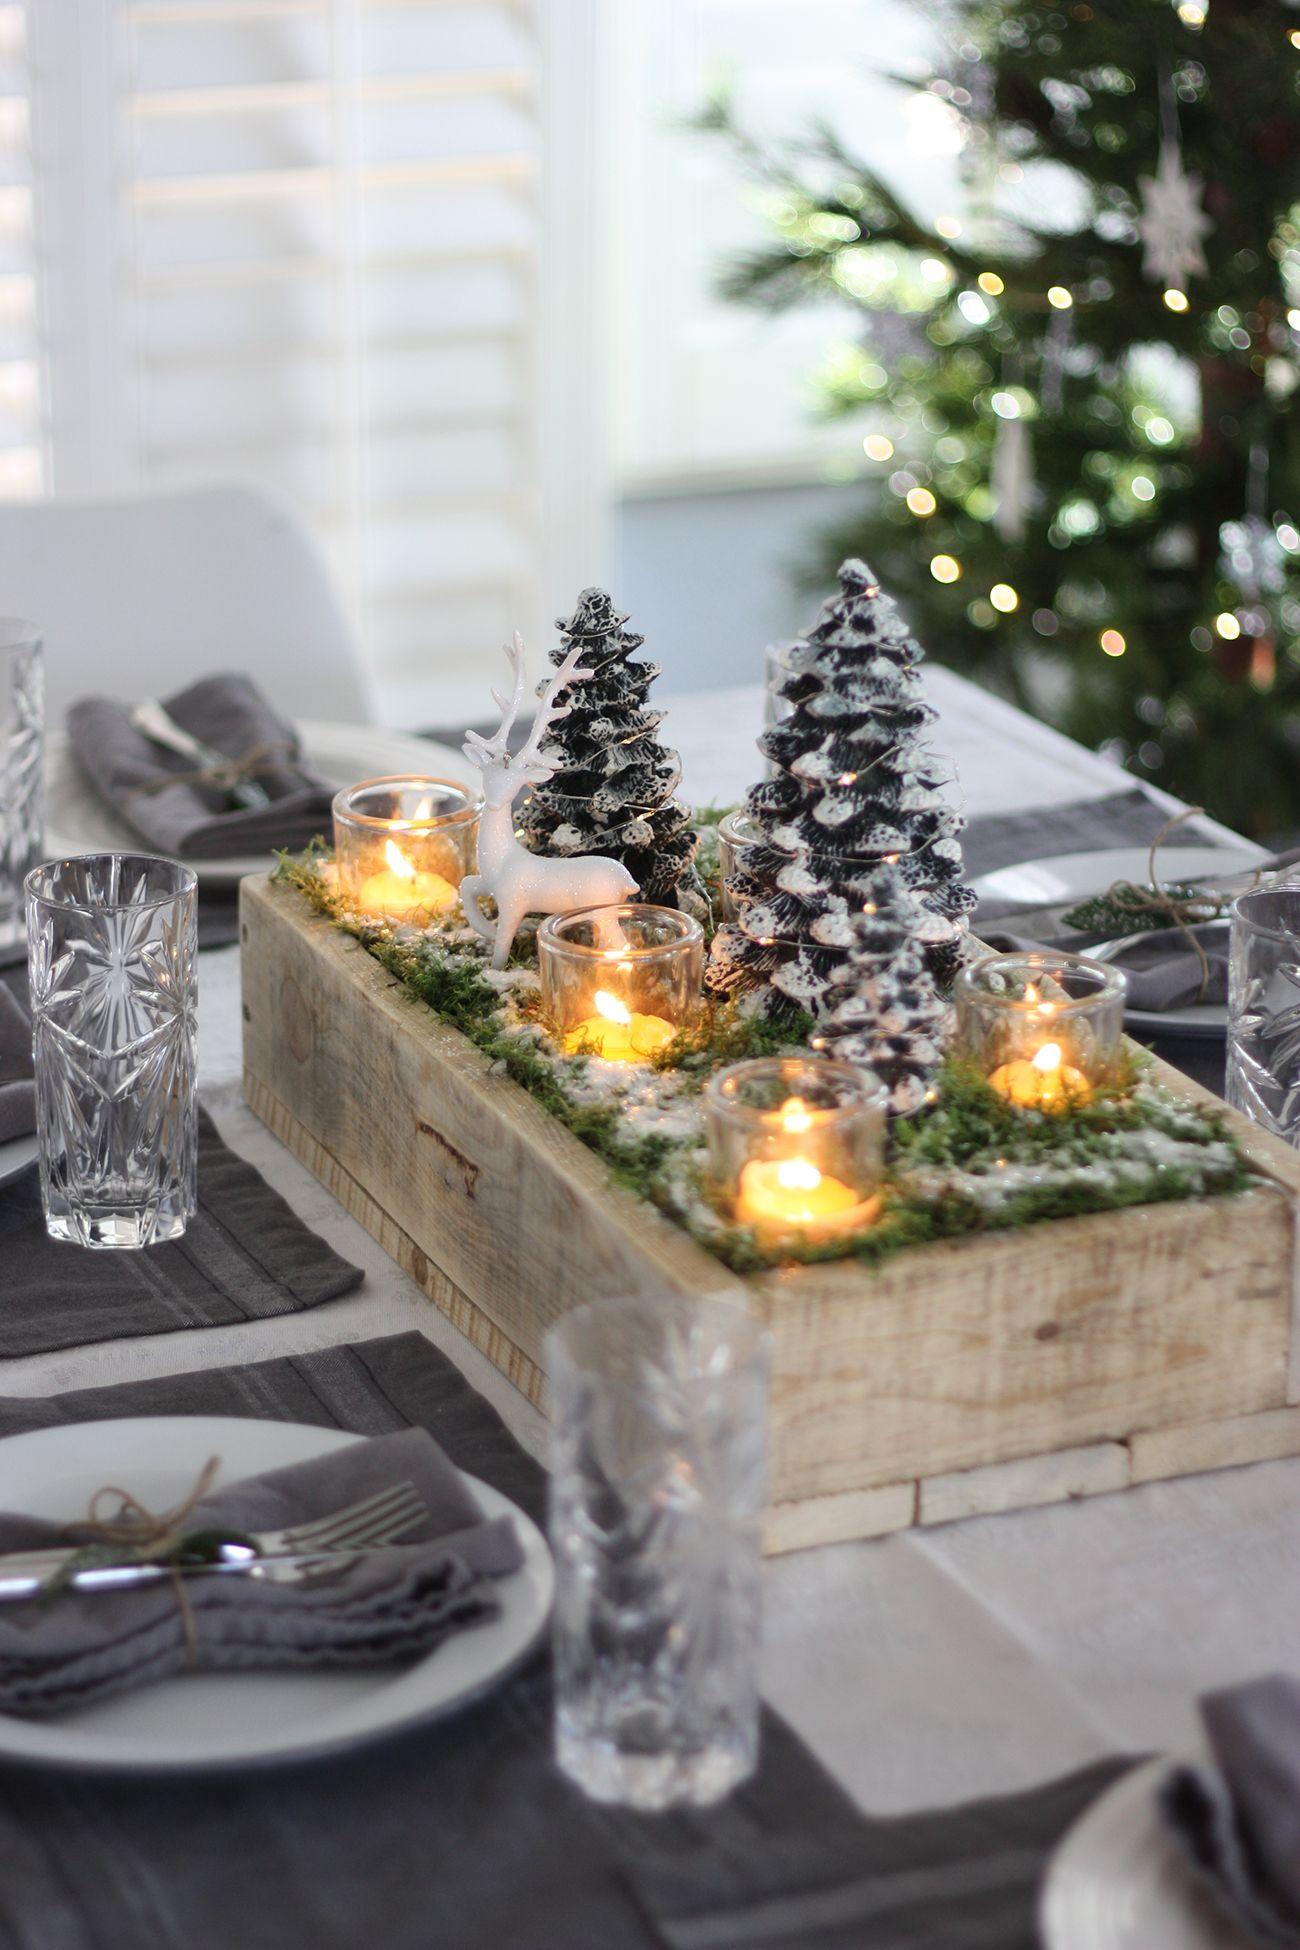 Christmas Table Diy Centerpiece Diy Christmas Table Christmas Centerpieces Diy Christmas Table